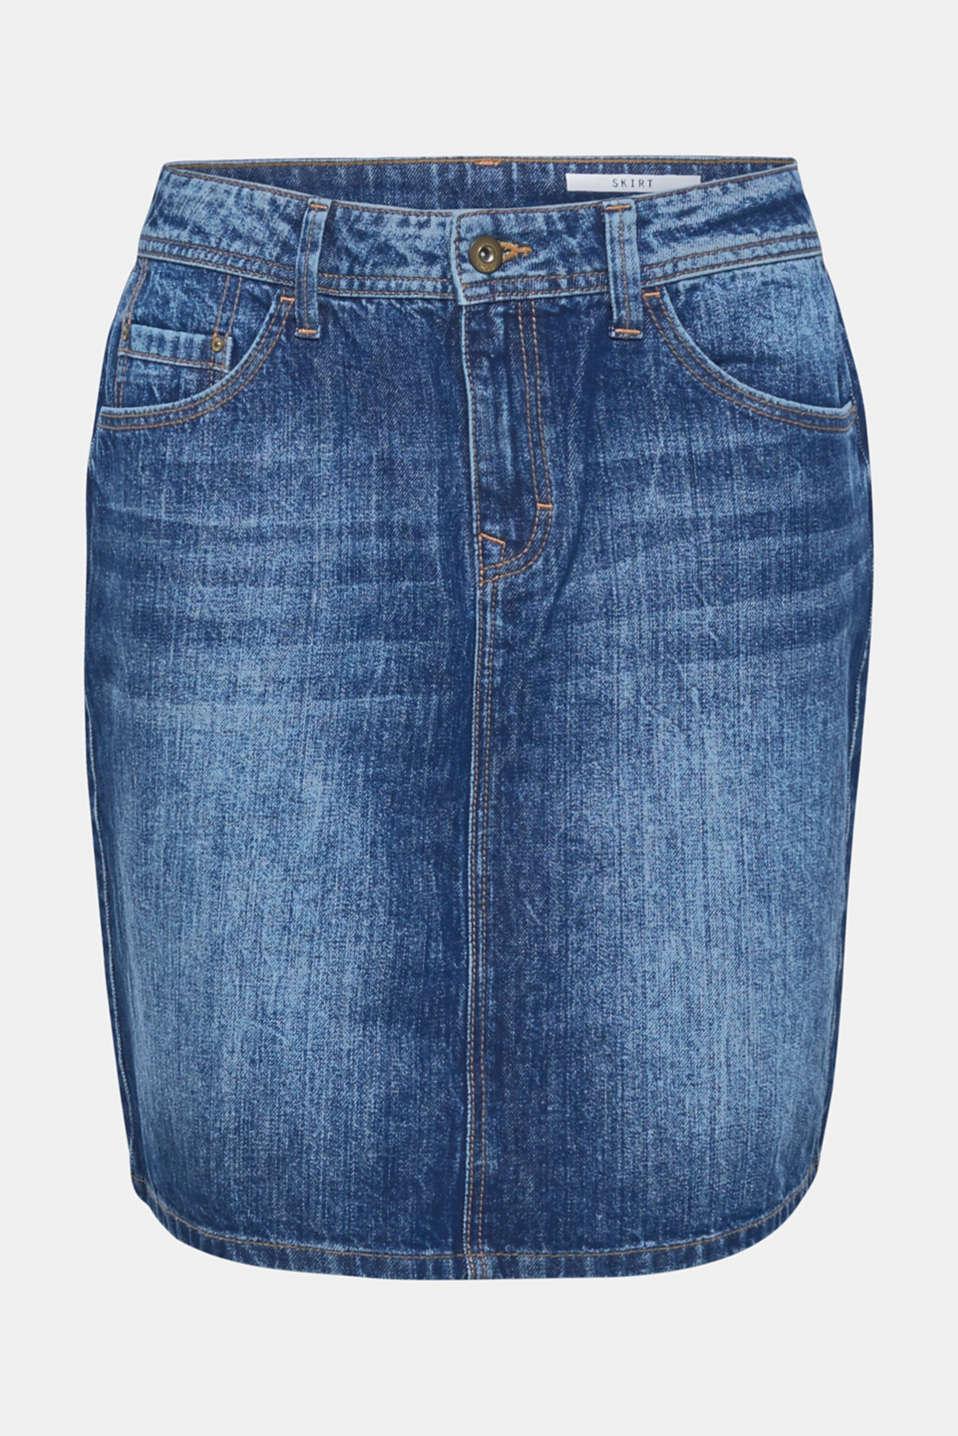 Skirts denim, BLUE DARK WASH, detail image number 8